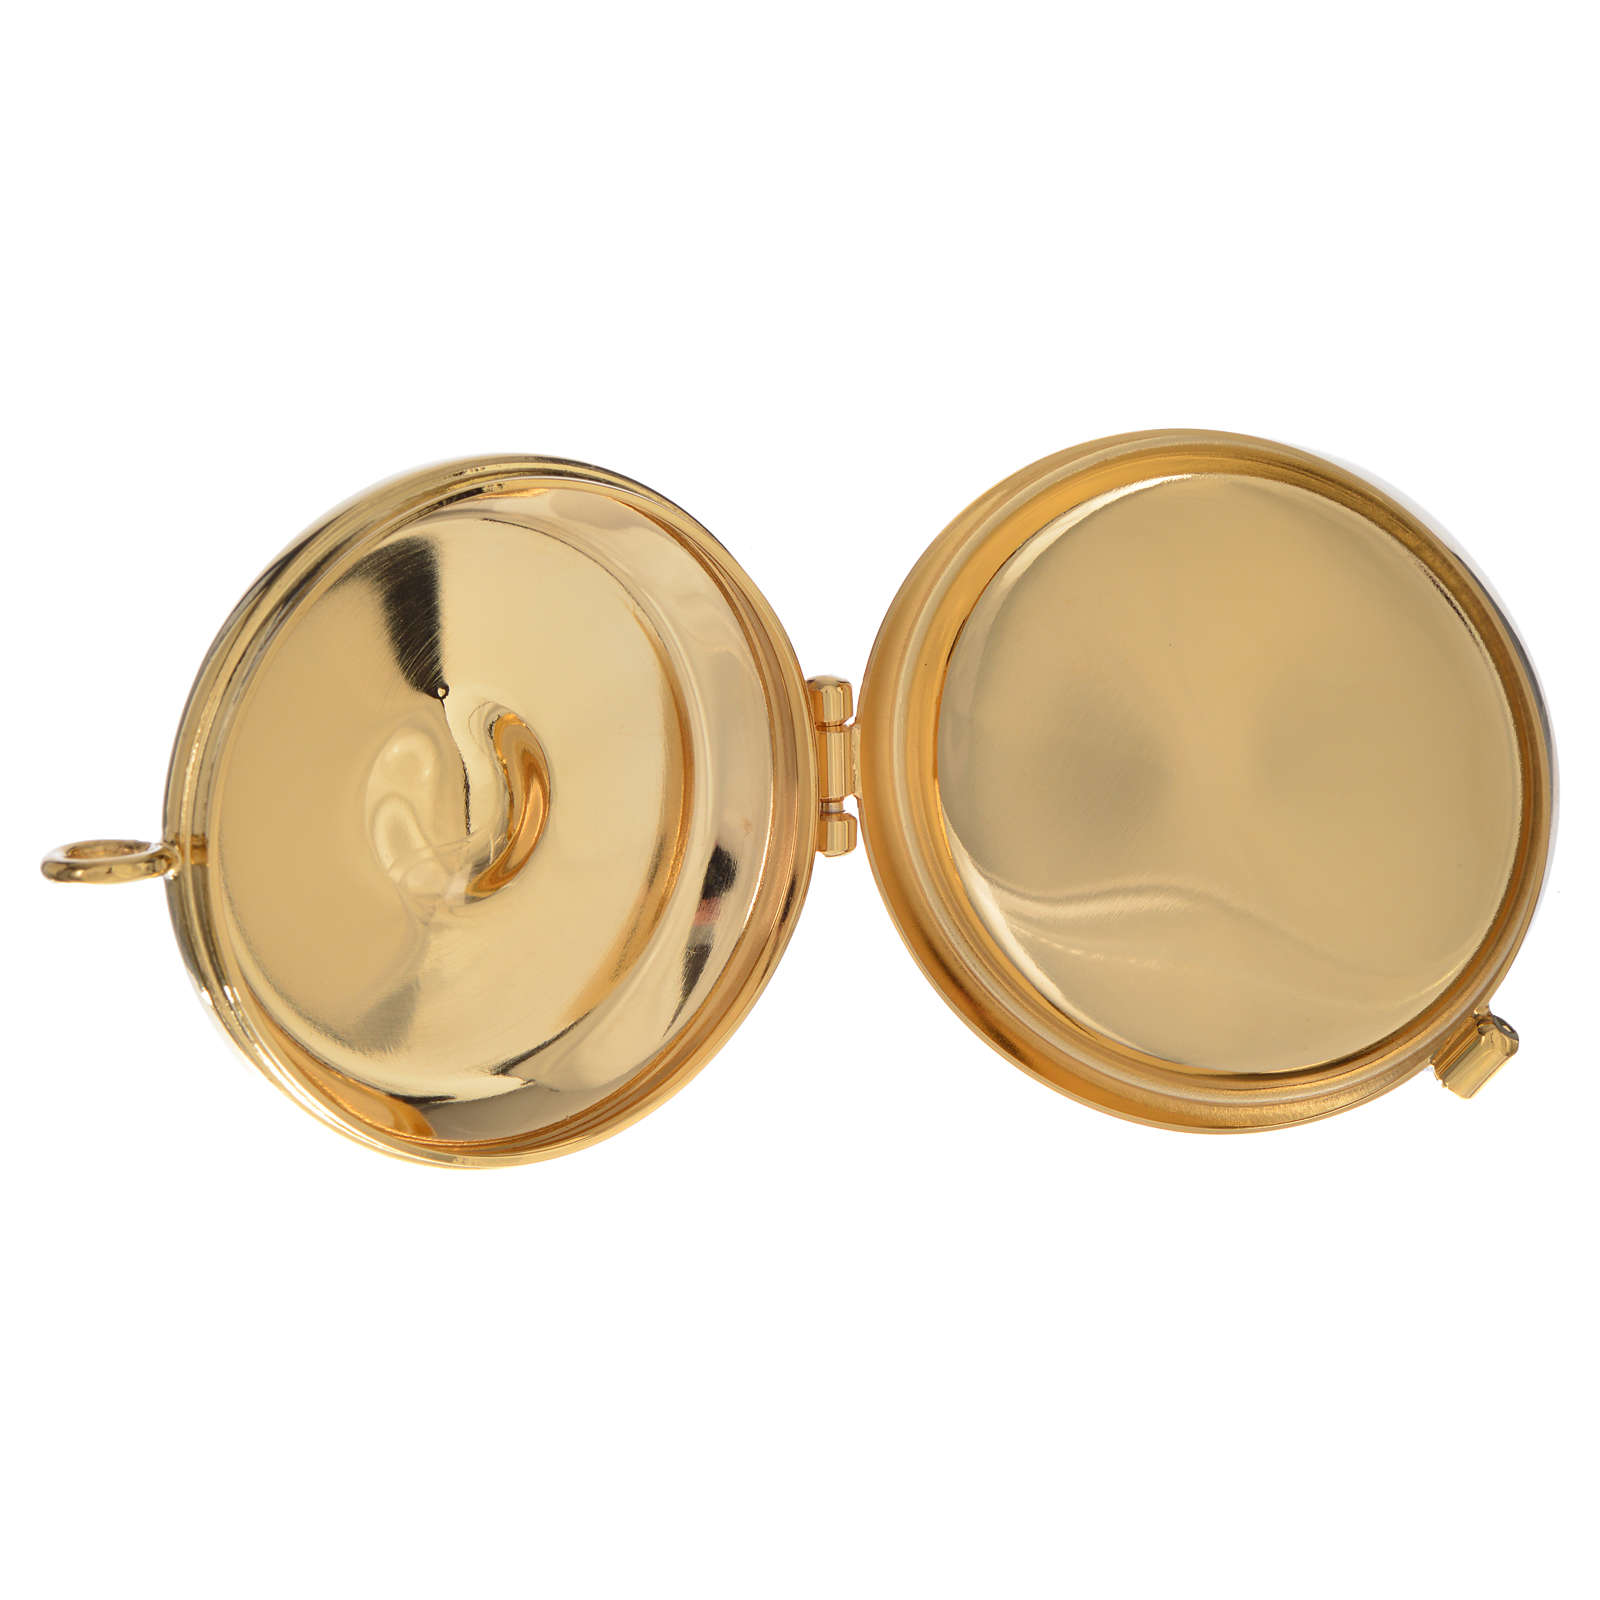 Caja para hostia plateada Cordero diámetro 53 mm 3